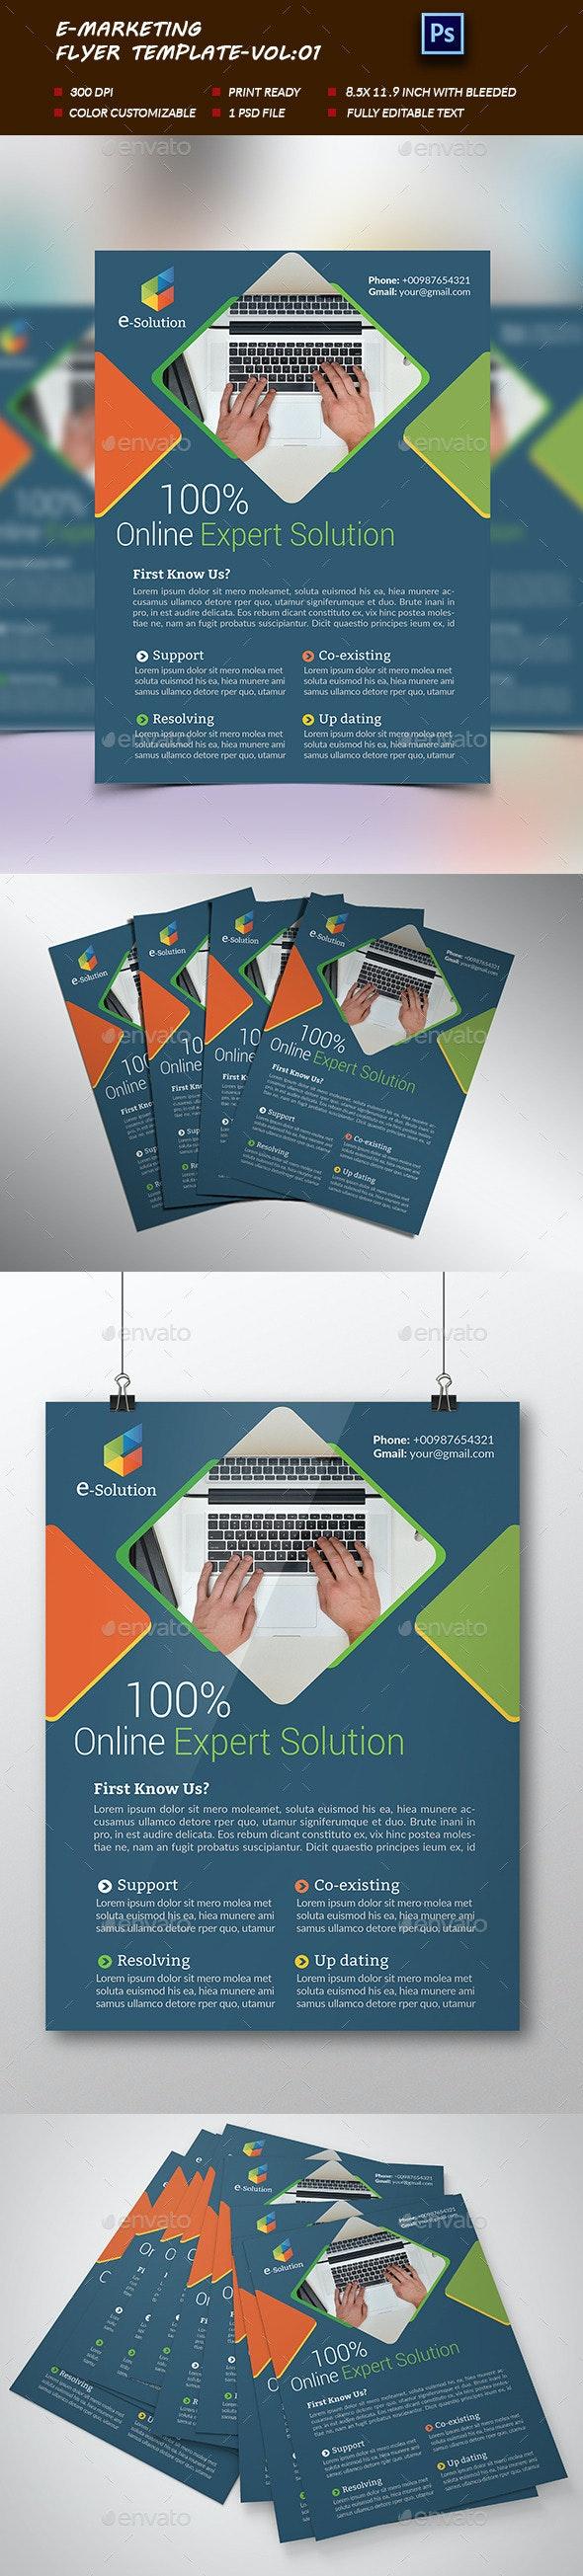 E-Marketing Business Flyer Template-Vol:01 - Corporate Flyers